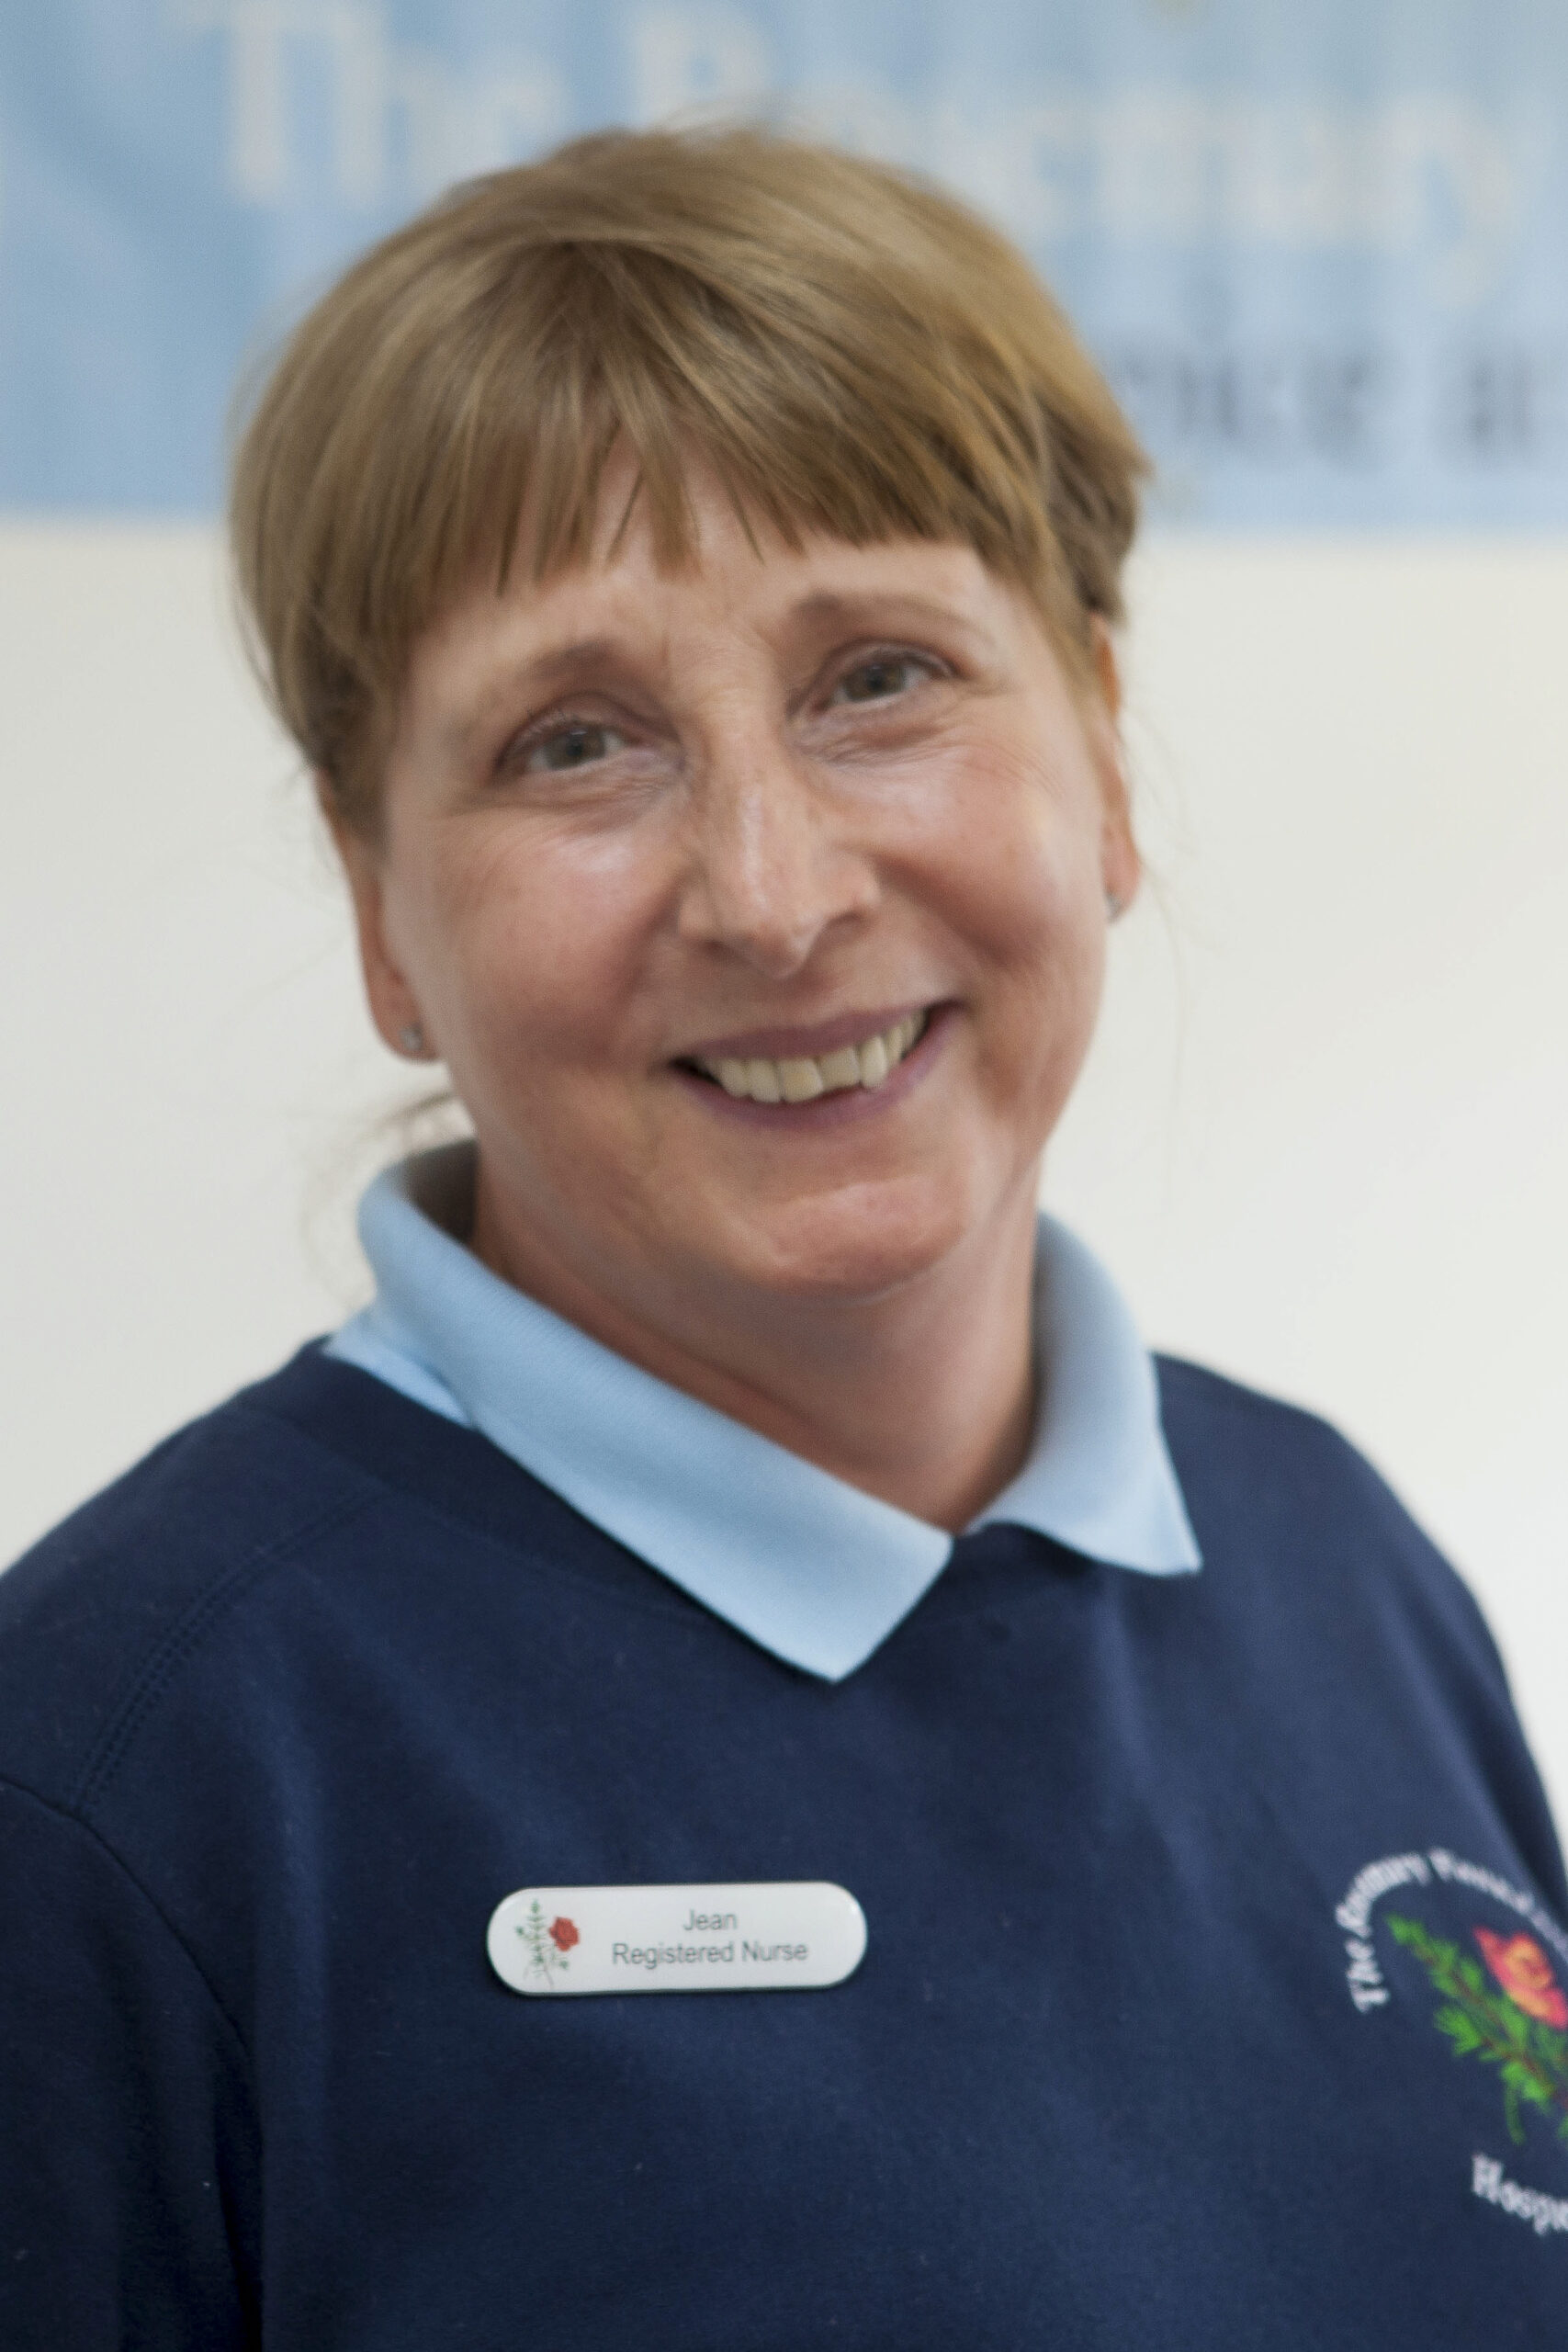 Jean Holloway - The Team at Rosemary Foundation